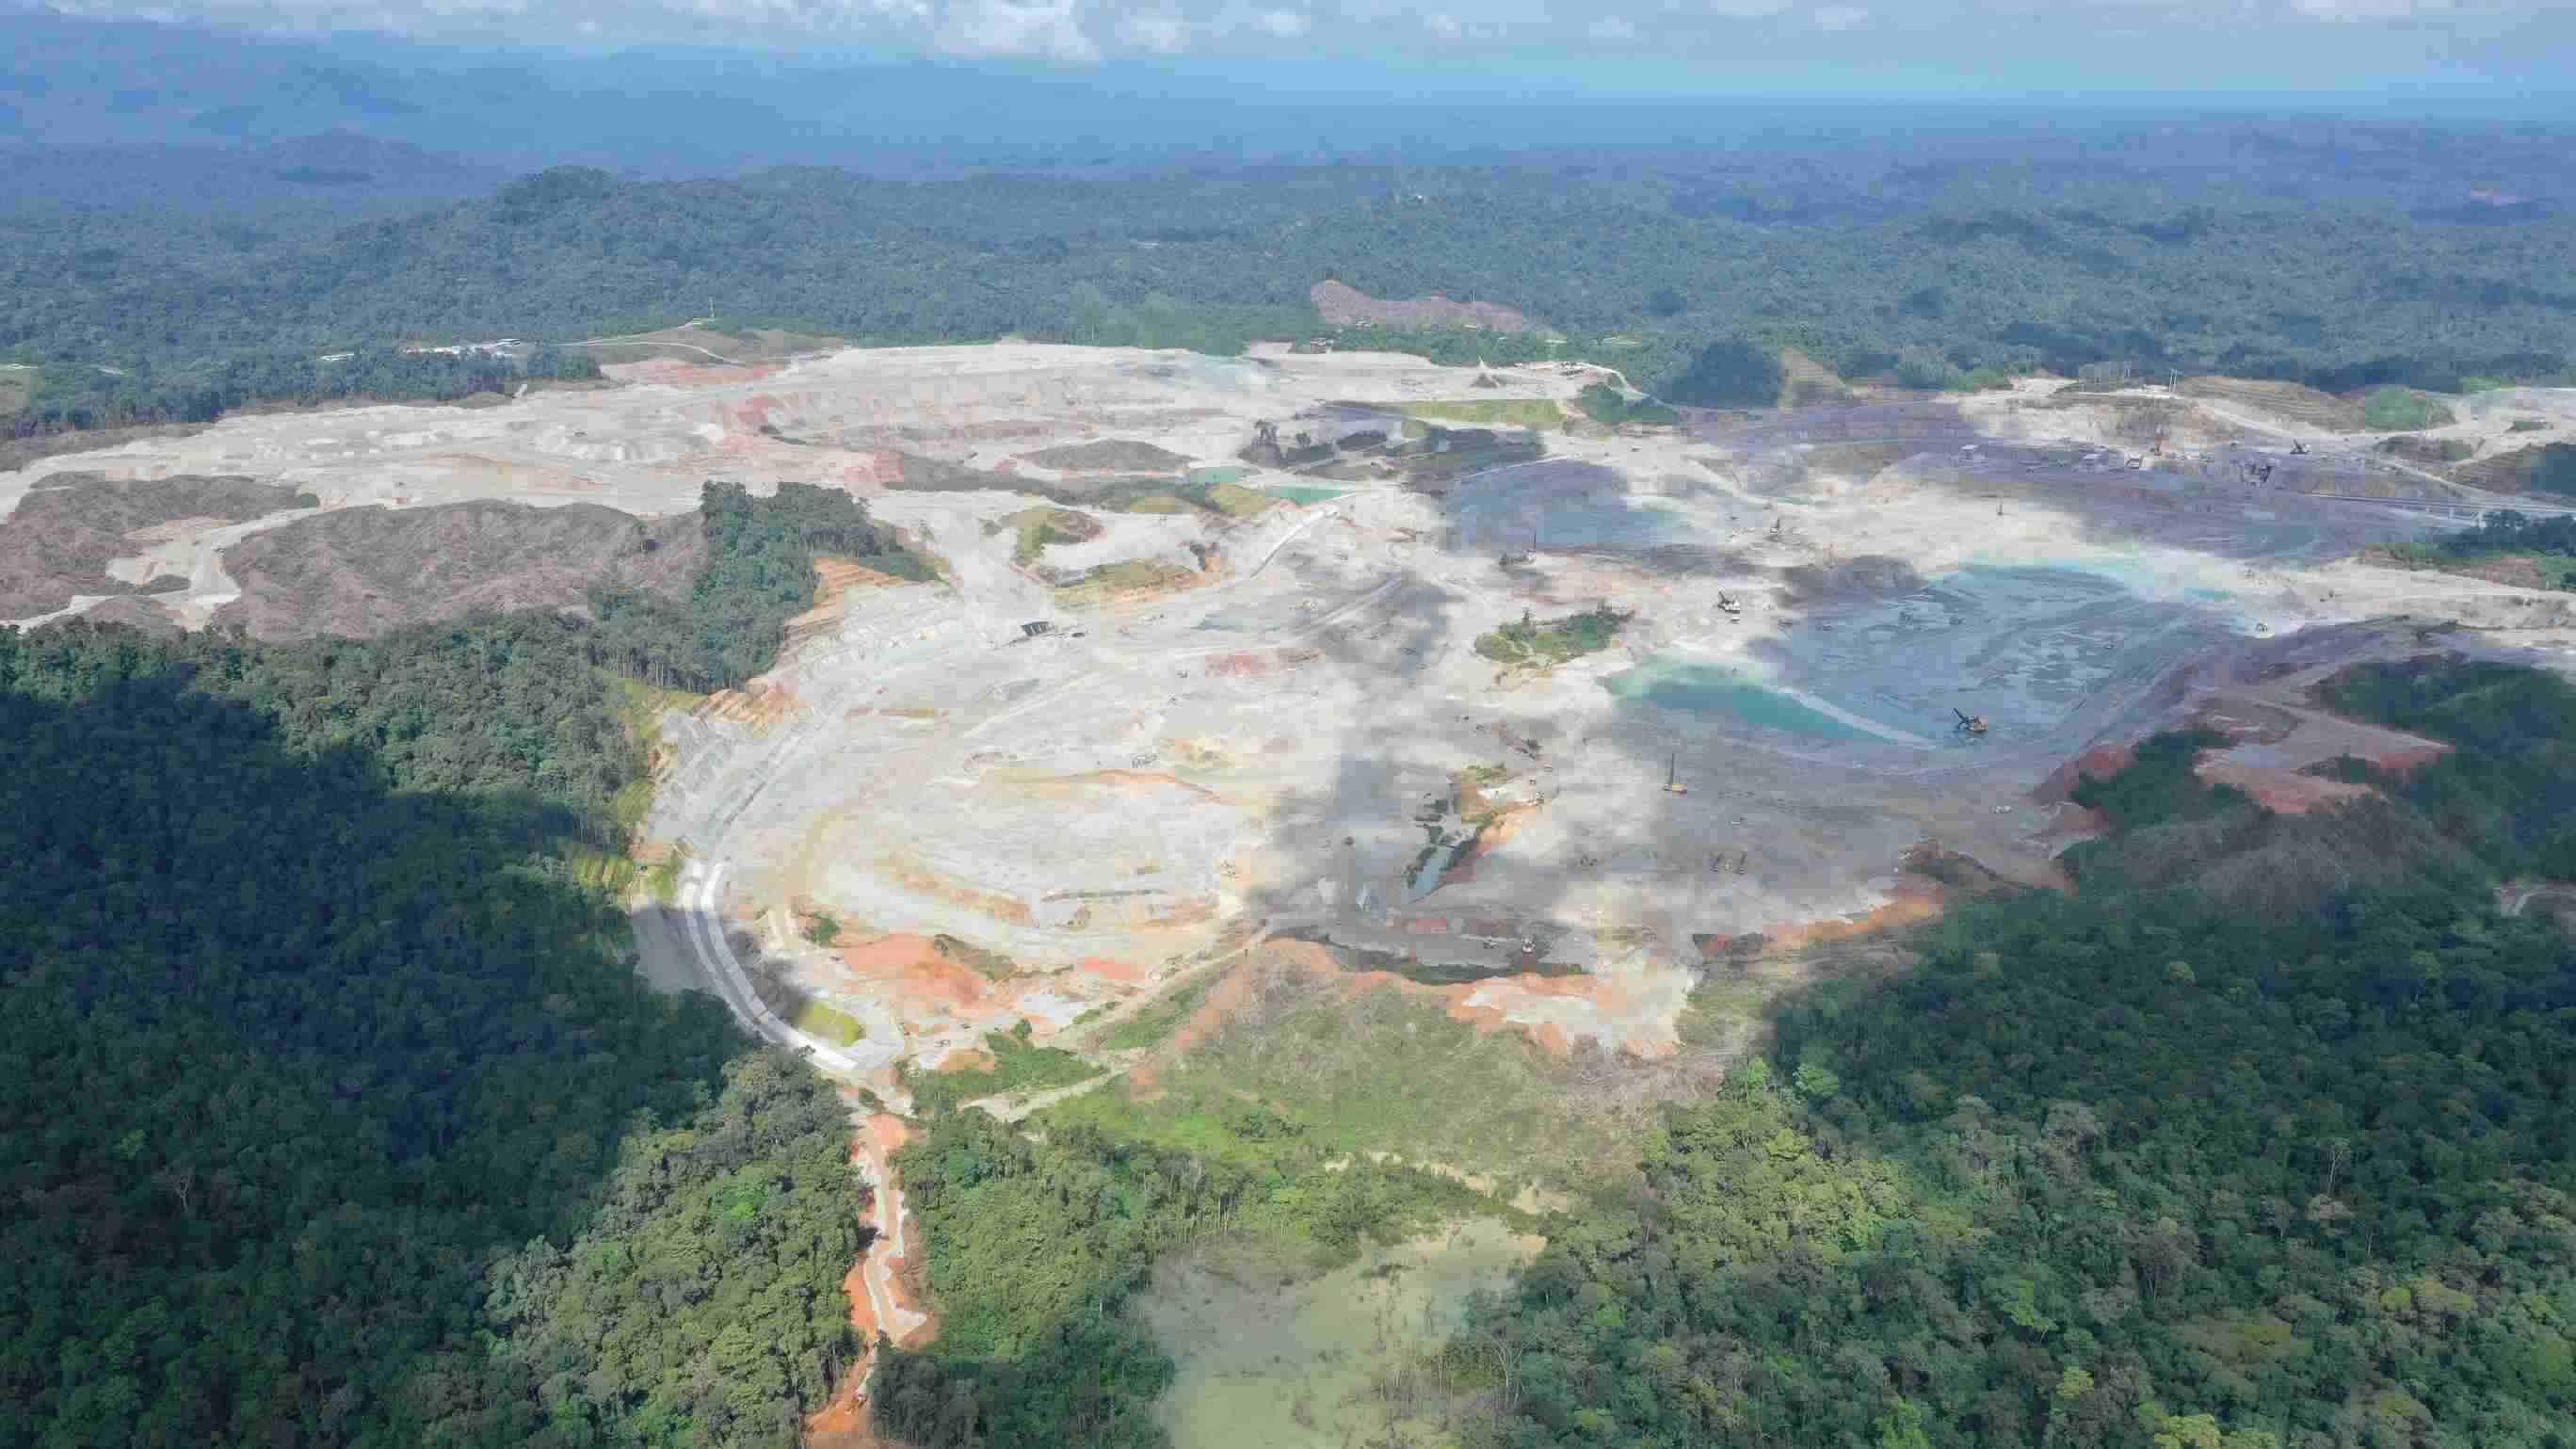 COVID-19: Latest impacts on LatAm mining